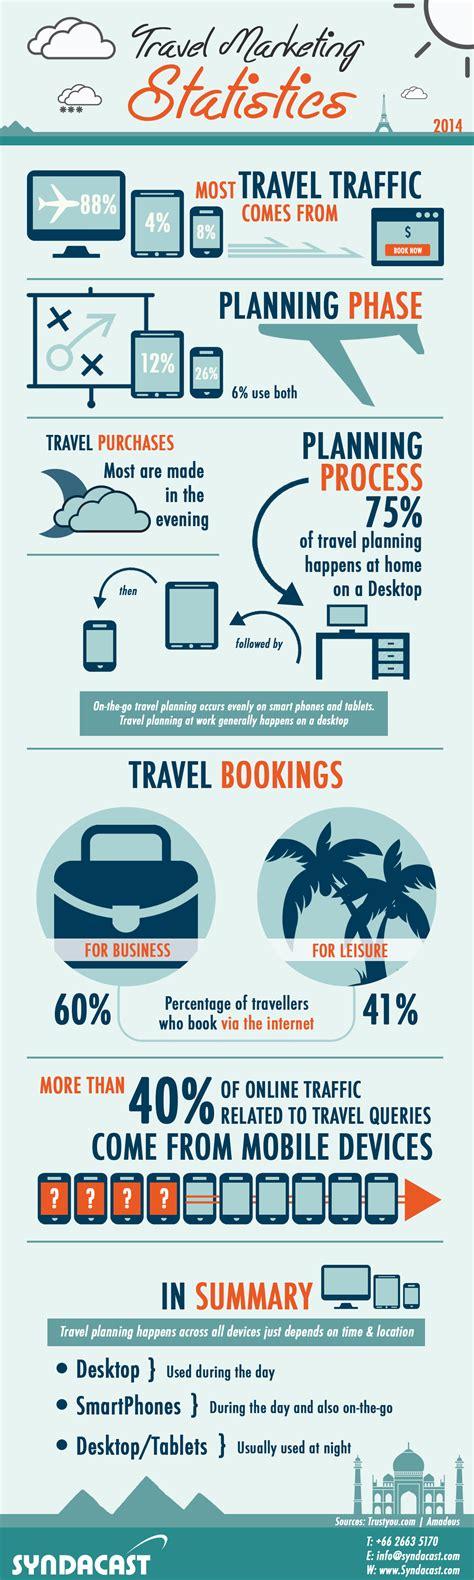 travel marketing statistics 2014 syndacast